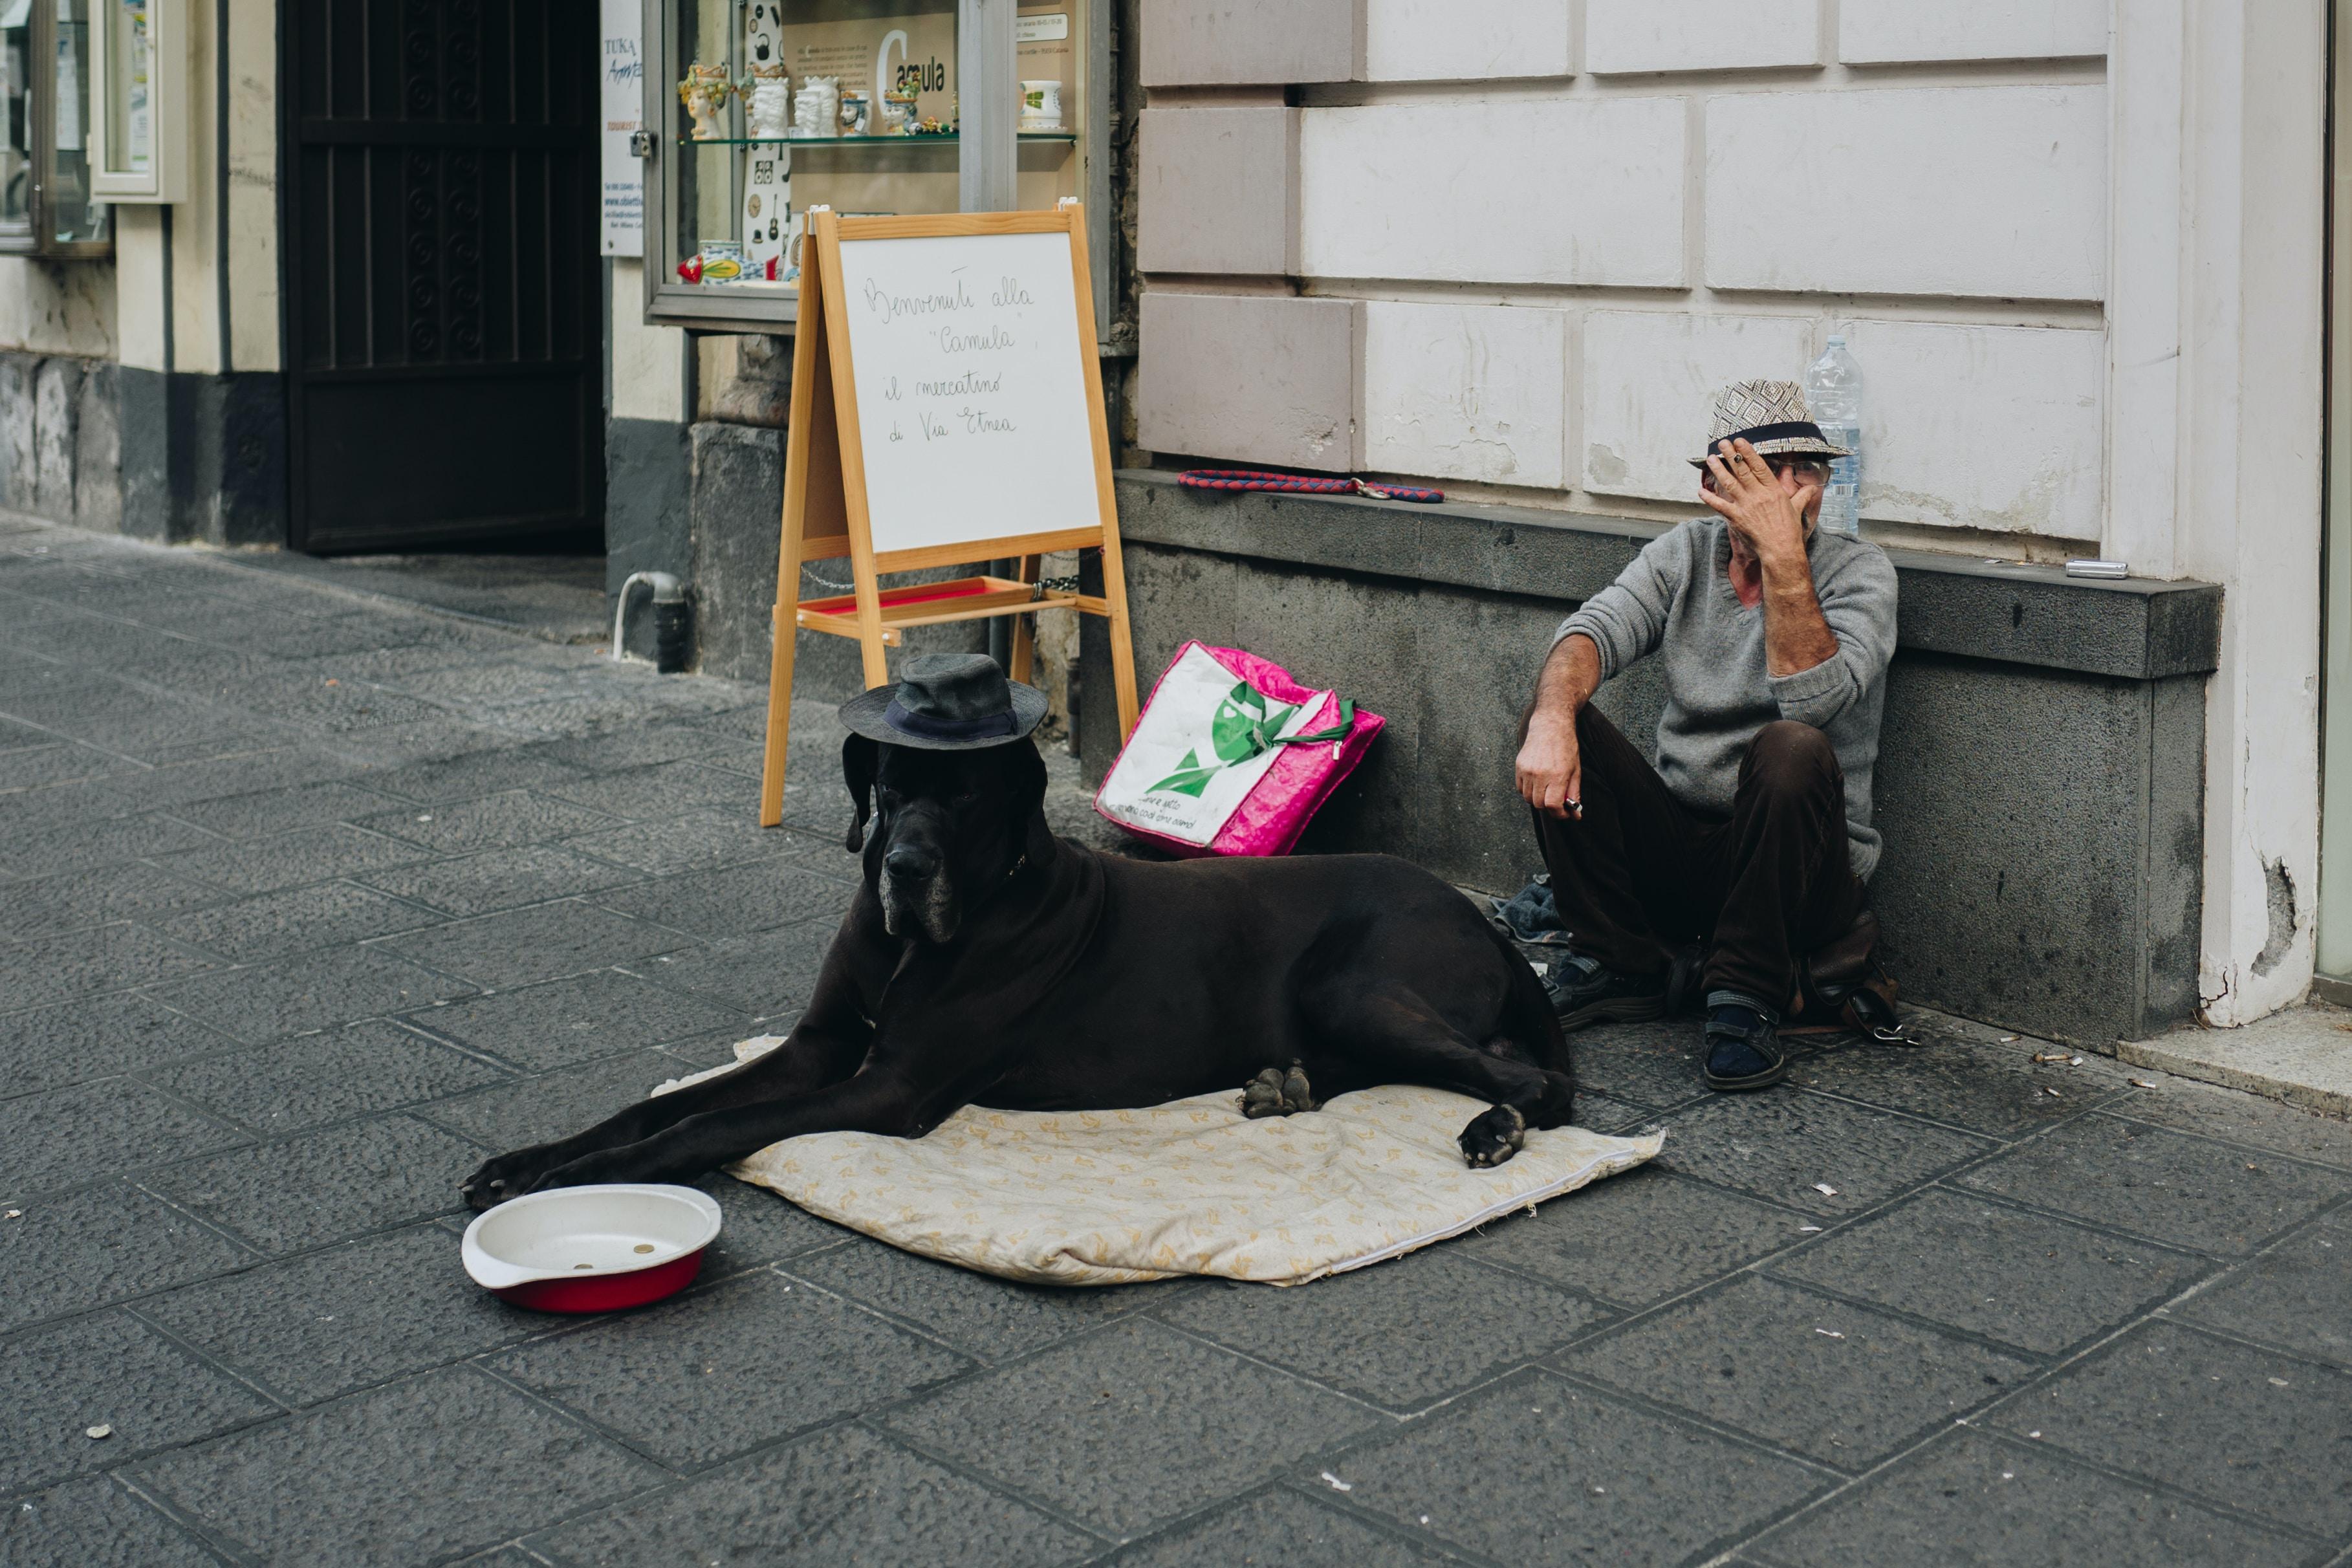 man sitting beside the dog